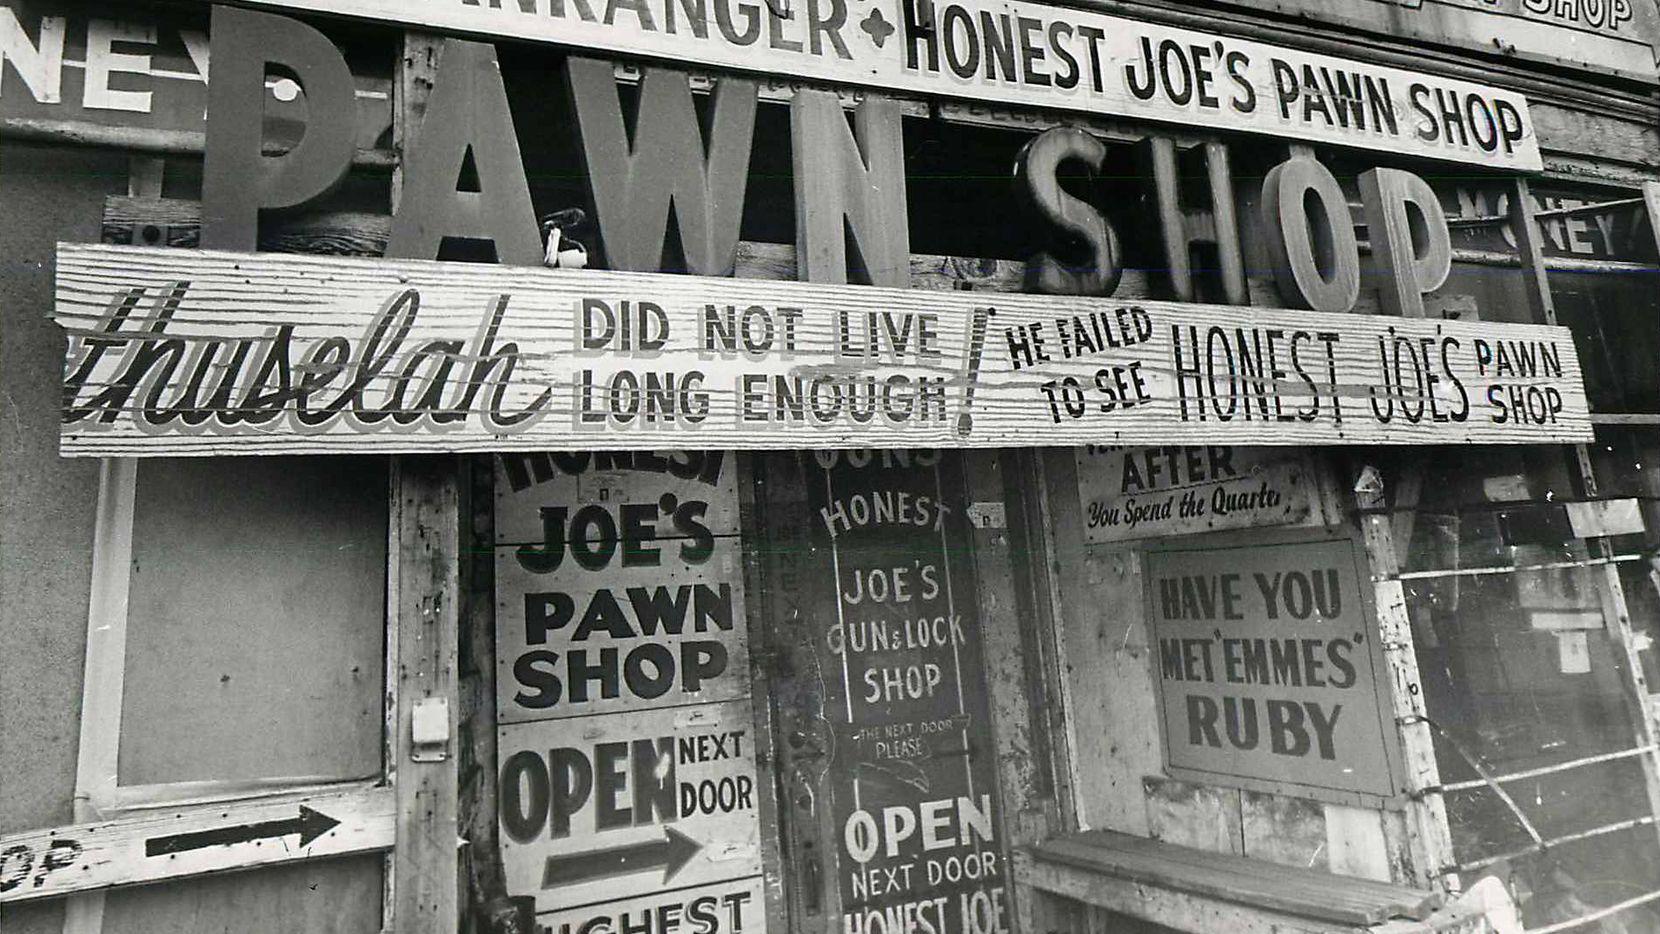 Honest Joe's Pawn Shop in Deep Ellum